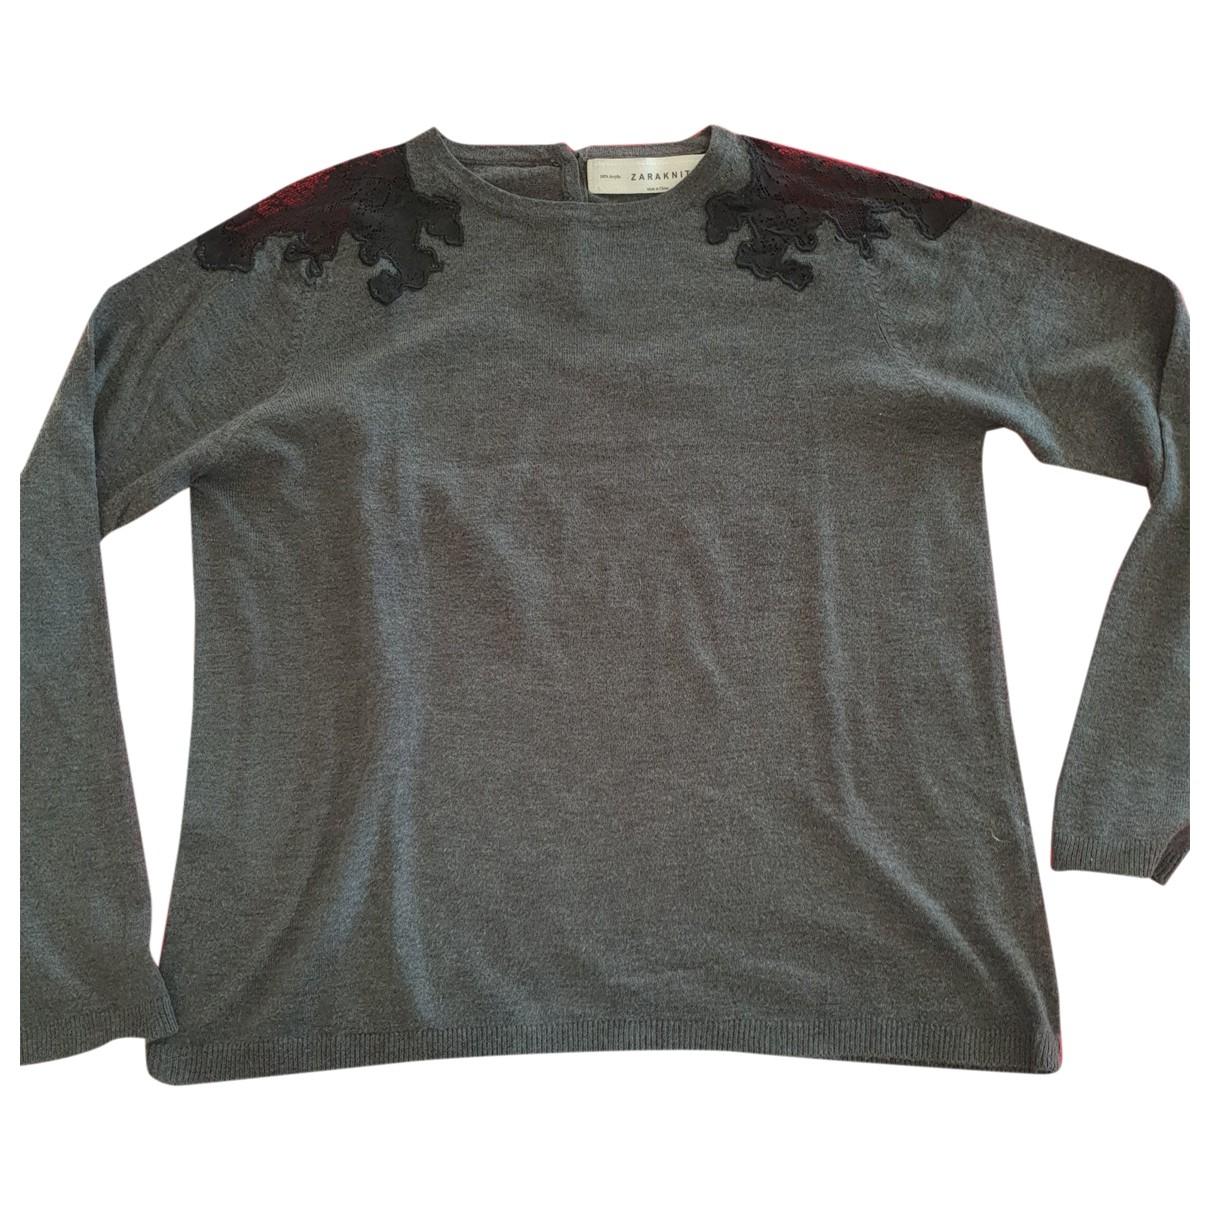 Zara - Top   pour femme en dentelle - gris